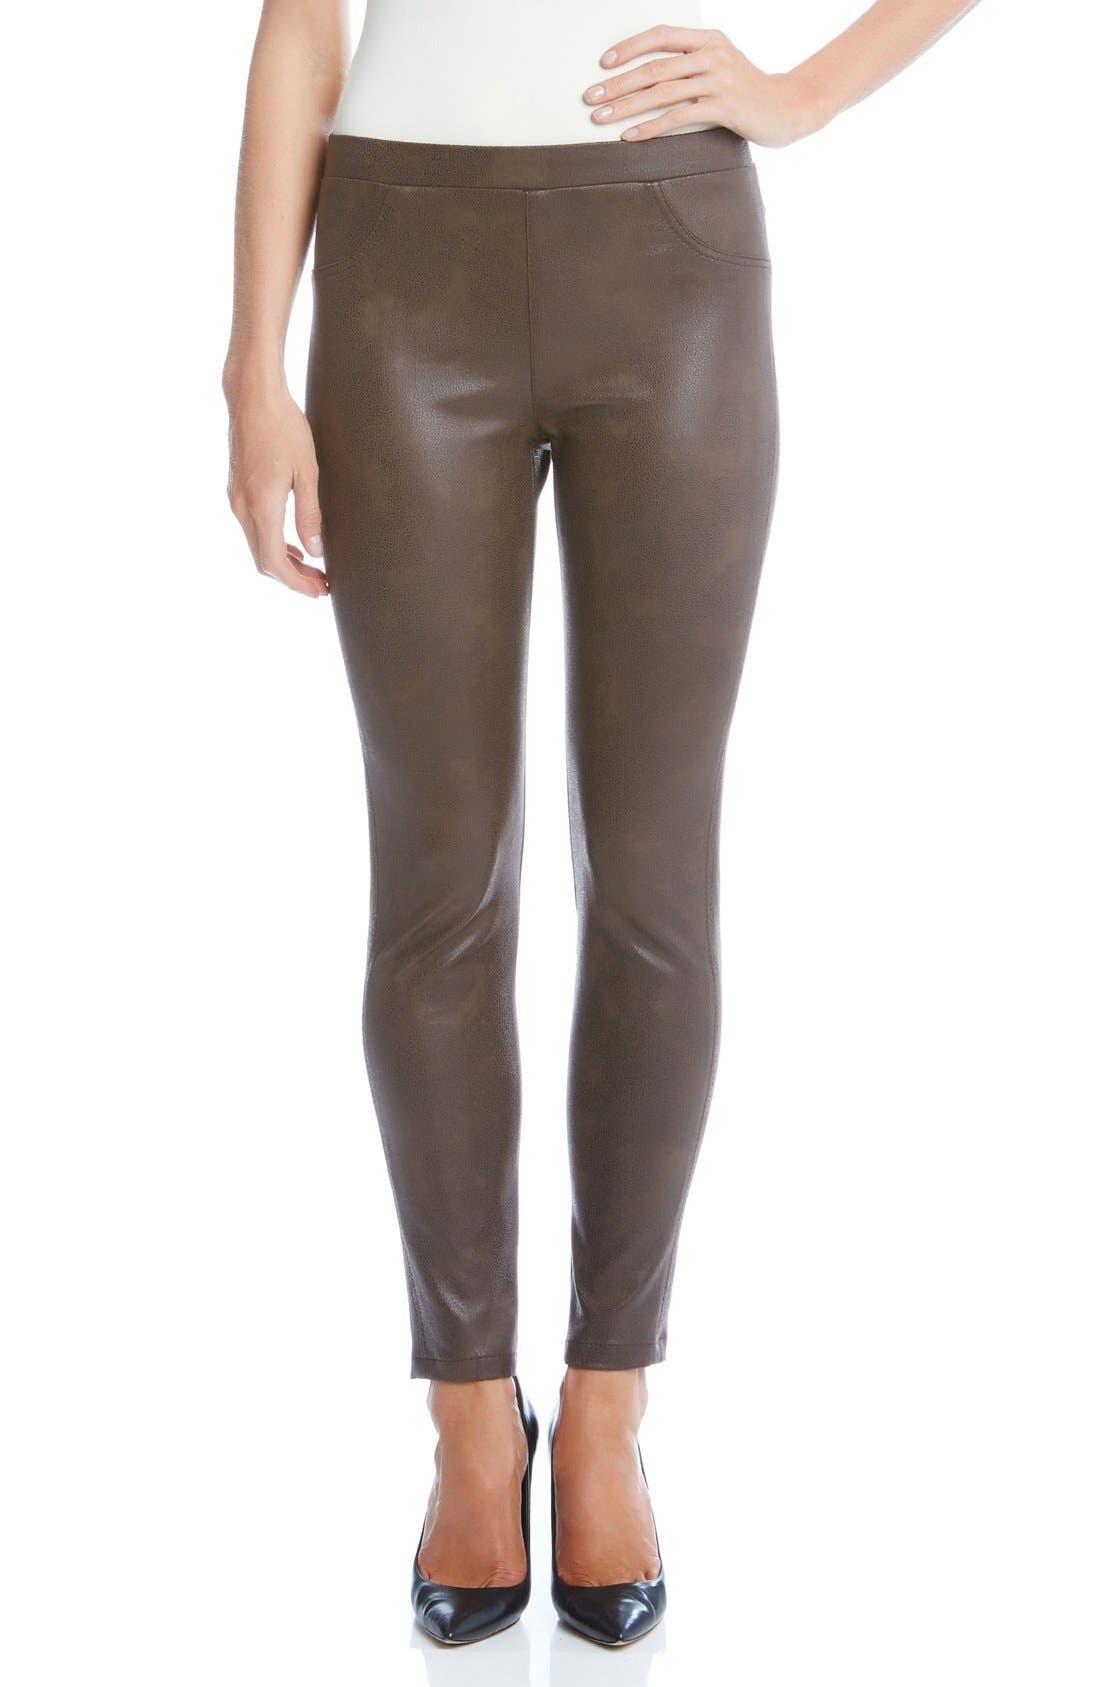 Karen Karen Stretch Faux Leather Skinny Pants,                         Main,                         color, Brown